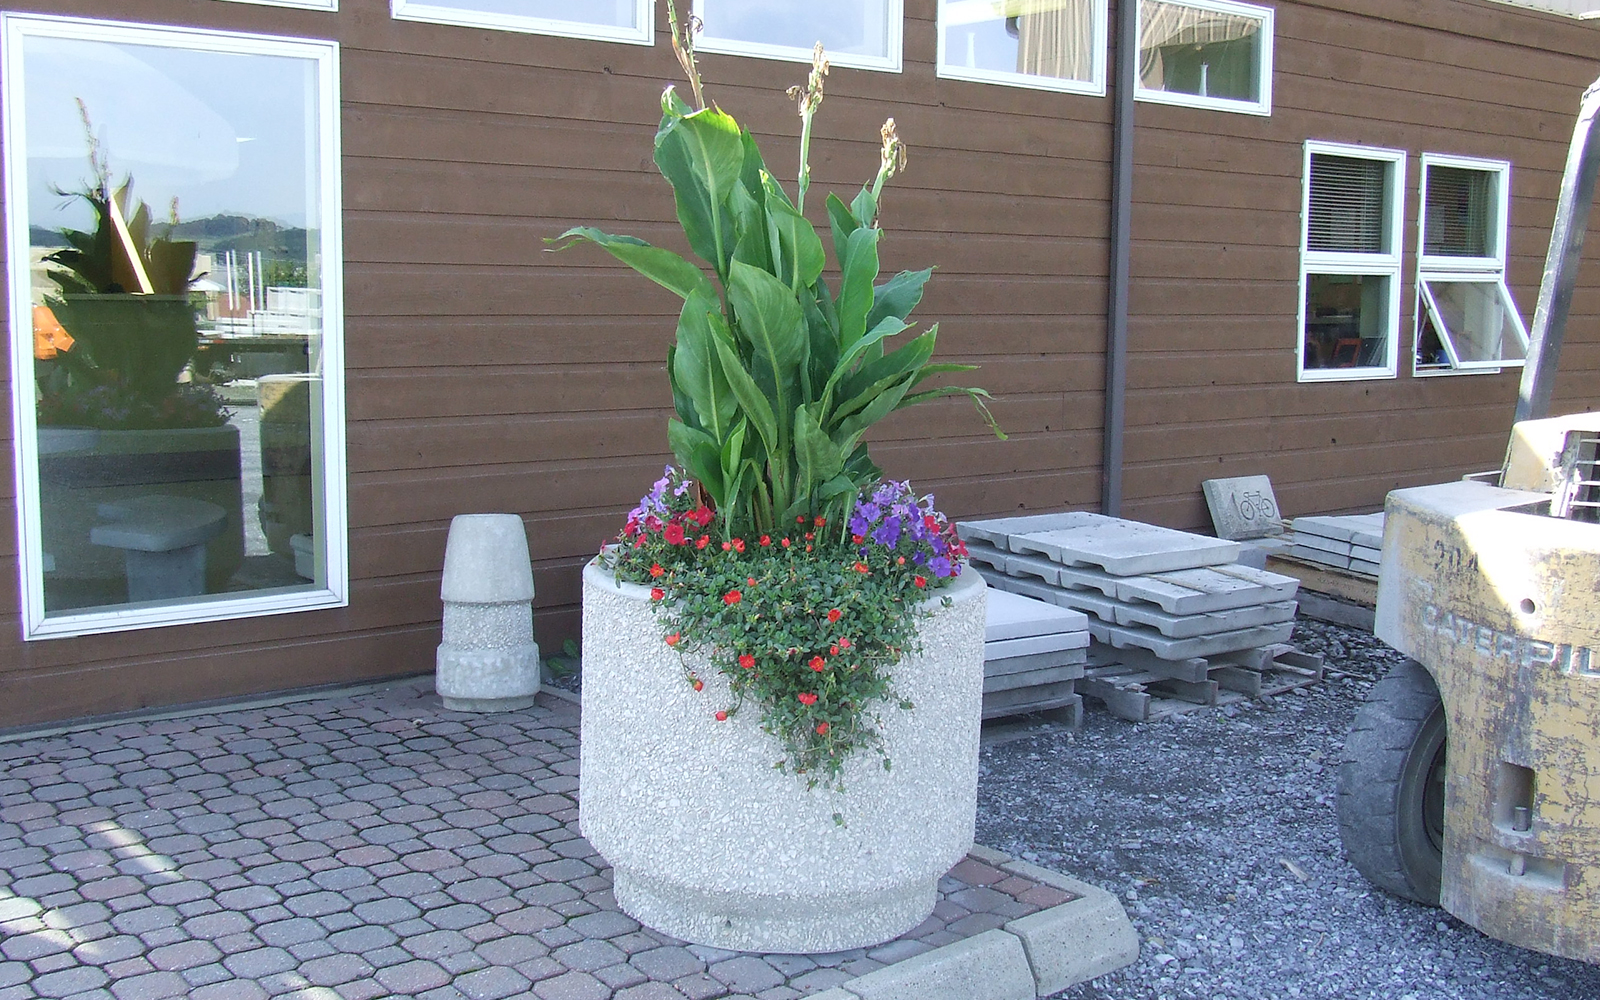 round-planter-with-plants